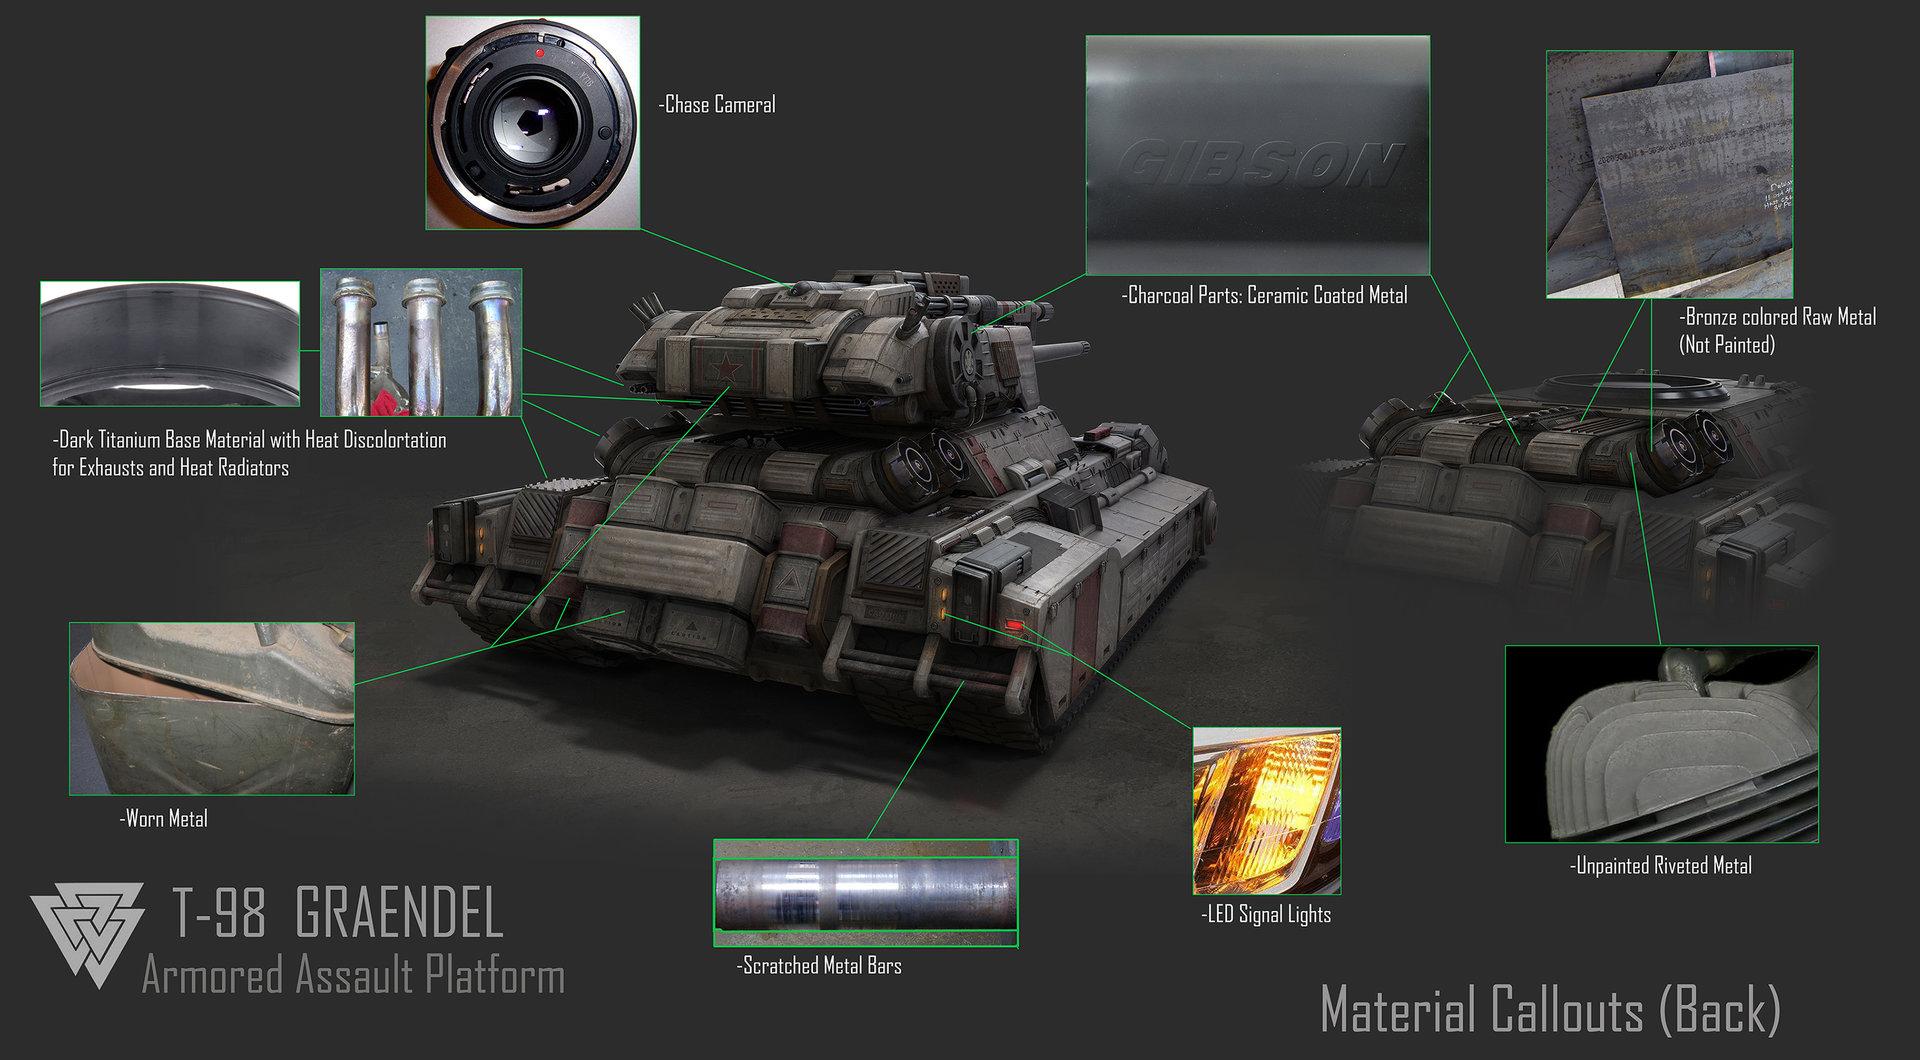 Muyoung kim 8 armor graendal back material callouts